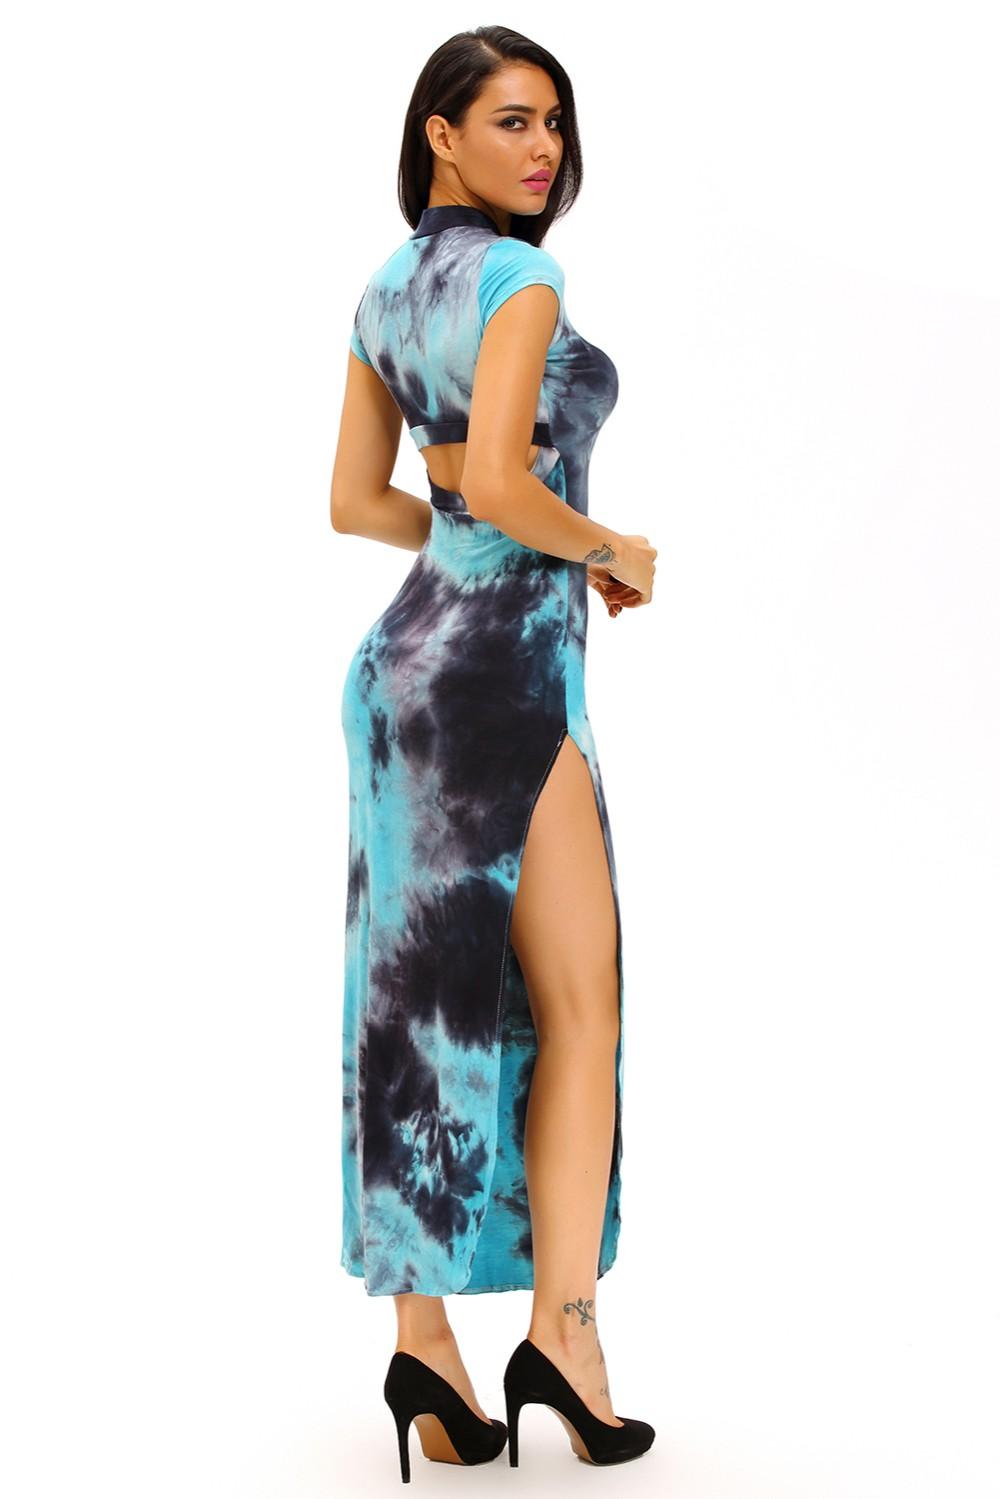 Bluish-Tie-Dye-Vintage-Short-Sleeve-Cheongsam-Dress-LC60955-4-8